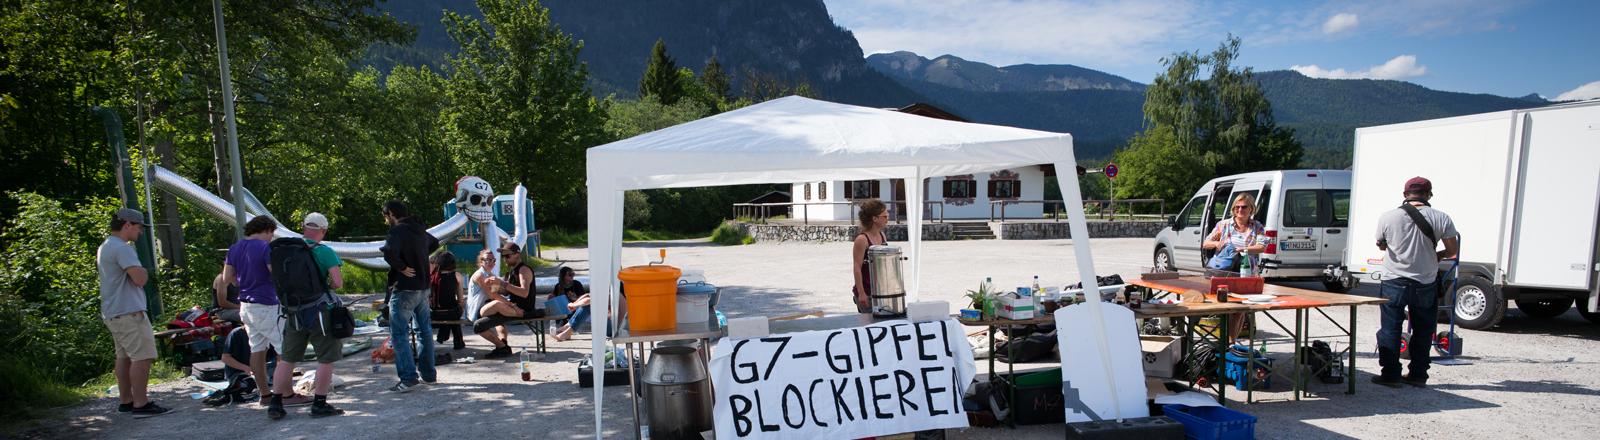 Protestcamp bei Schloss Elmau